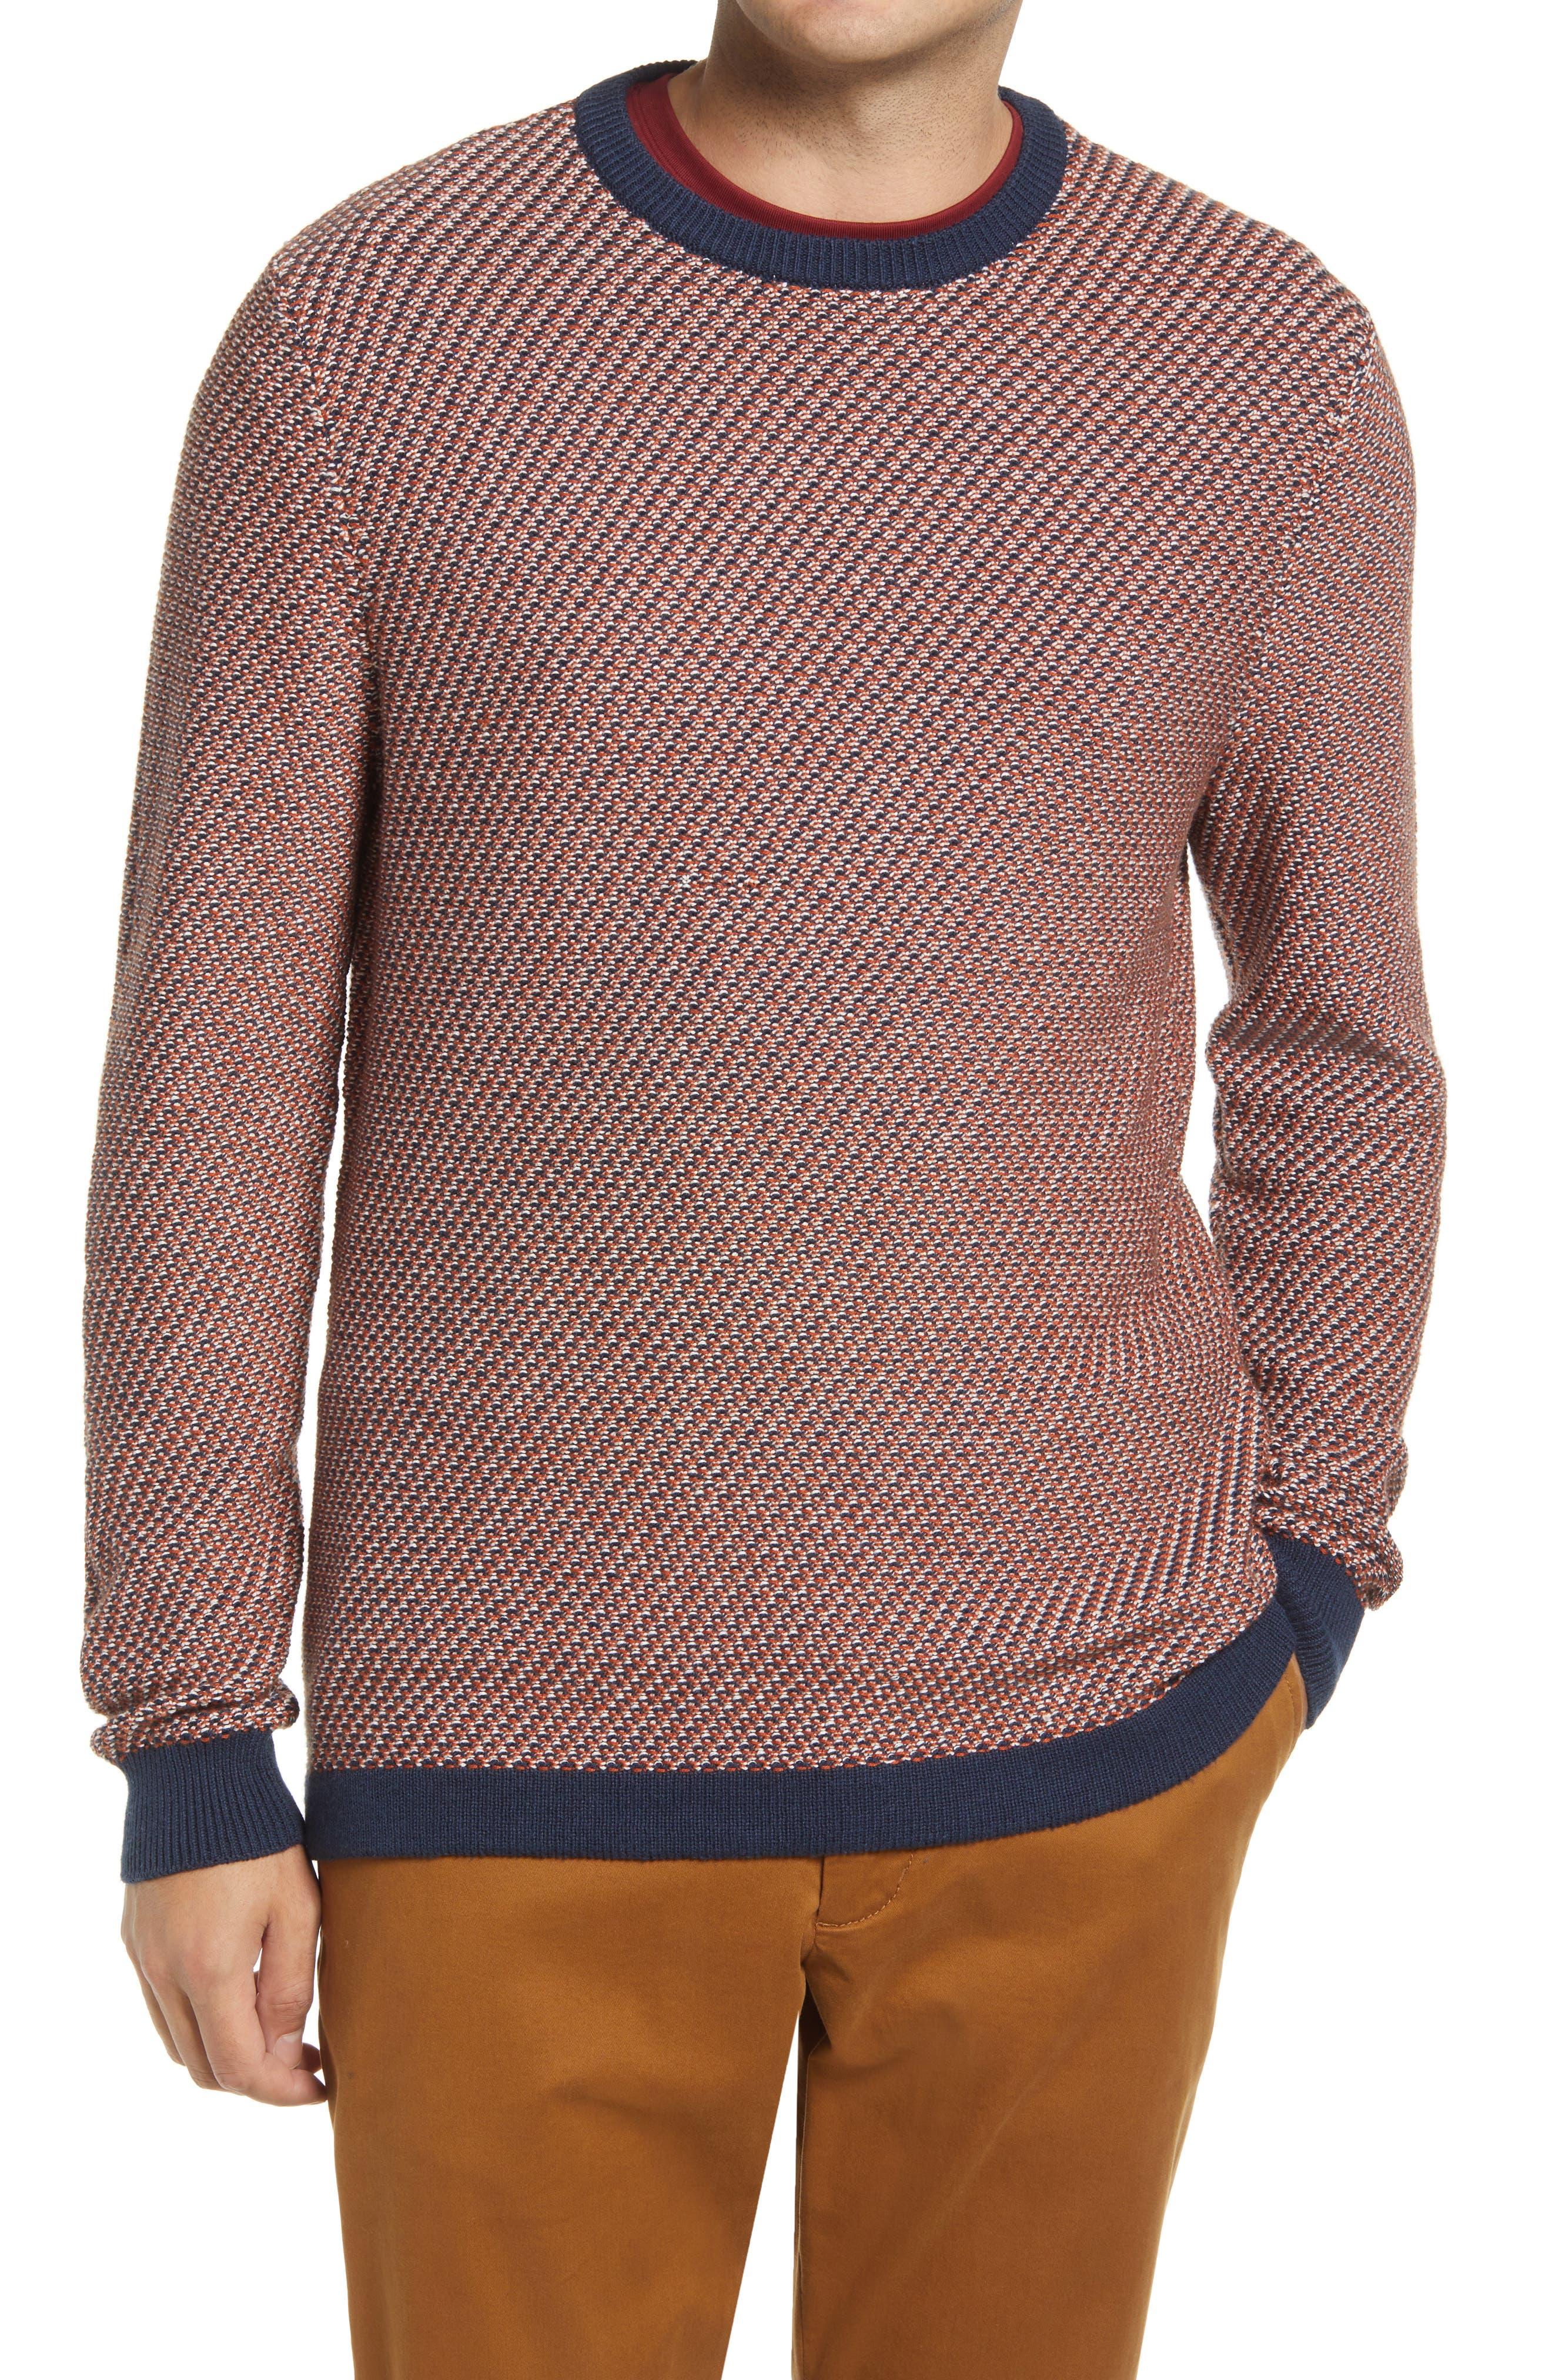 1920s Men's Sweaters, Cardigans, Knitwear Nordstrom Mini Pattern Crewneck Sweater Size Xx-Large in Navy Blazer Multi at Nordstrom $49.50 AT vintagedancer.com